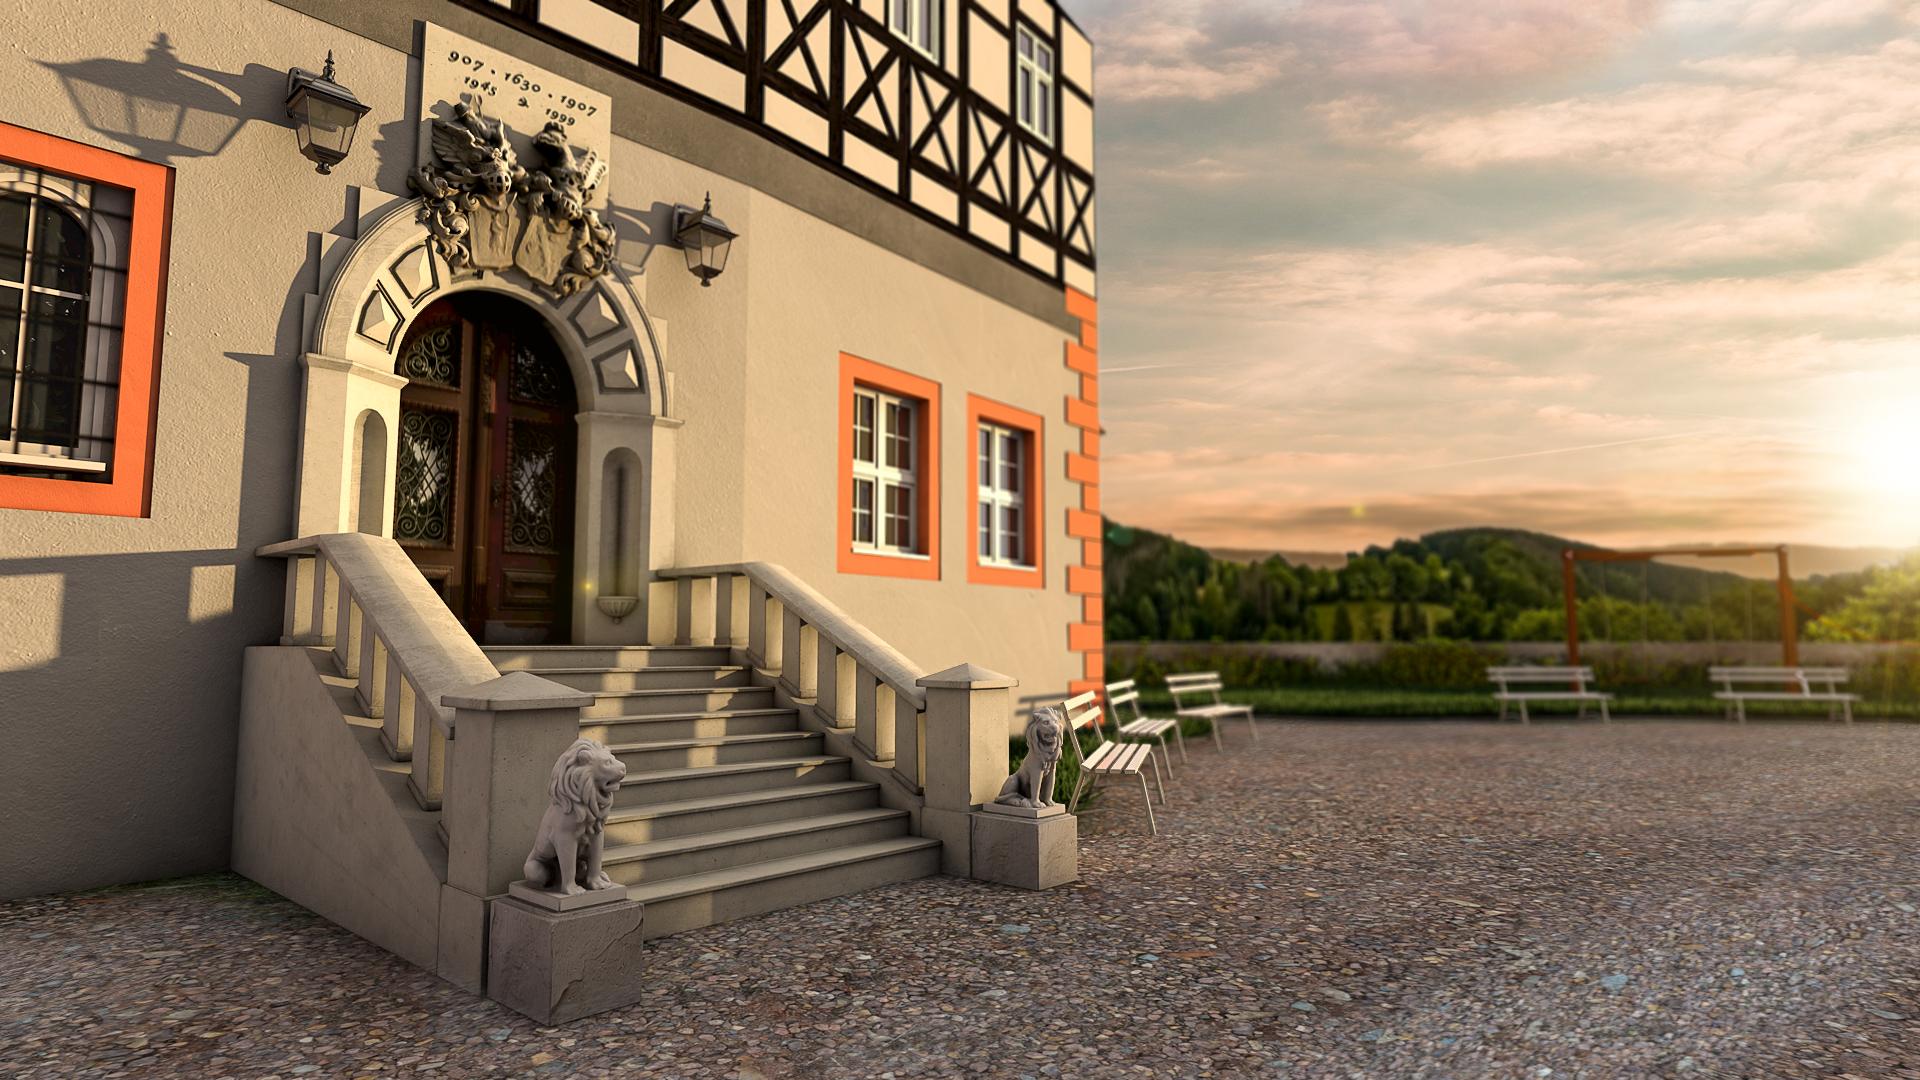 Schloss_Eingang_ohne_Rahmen